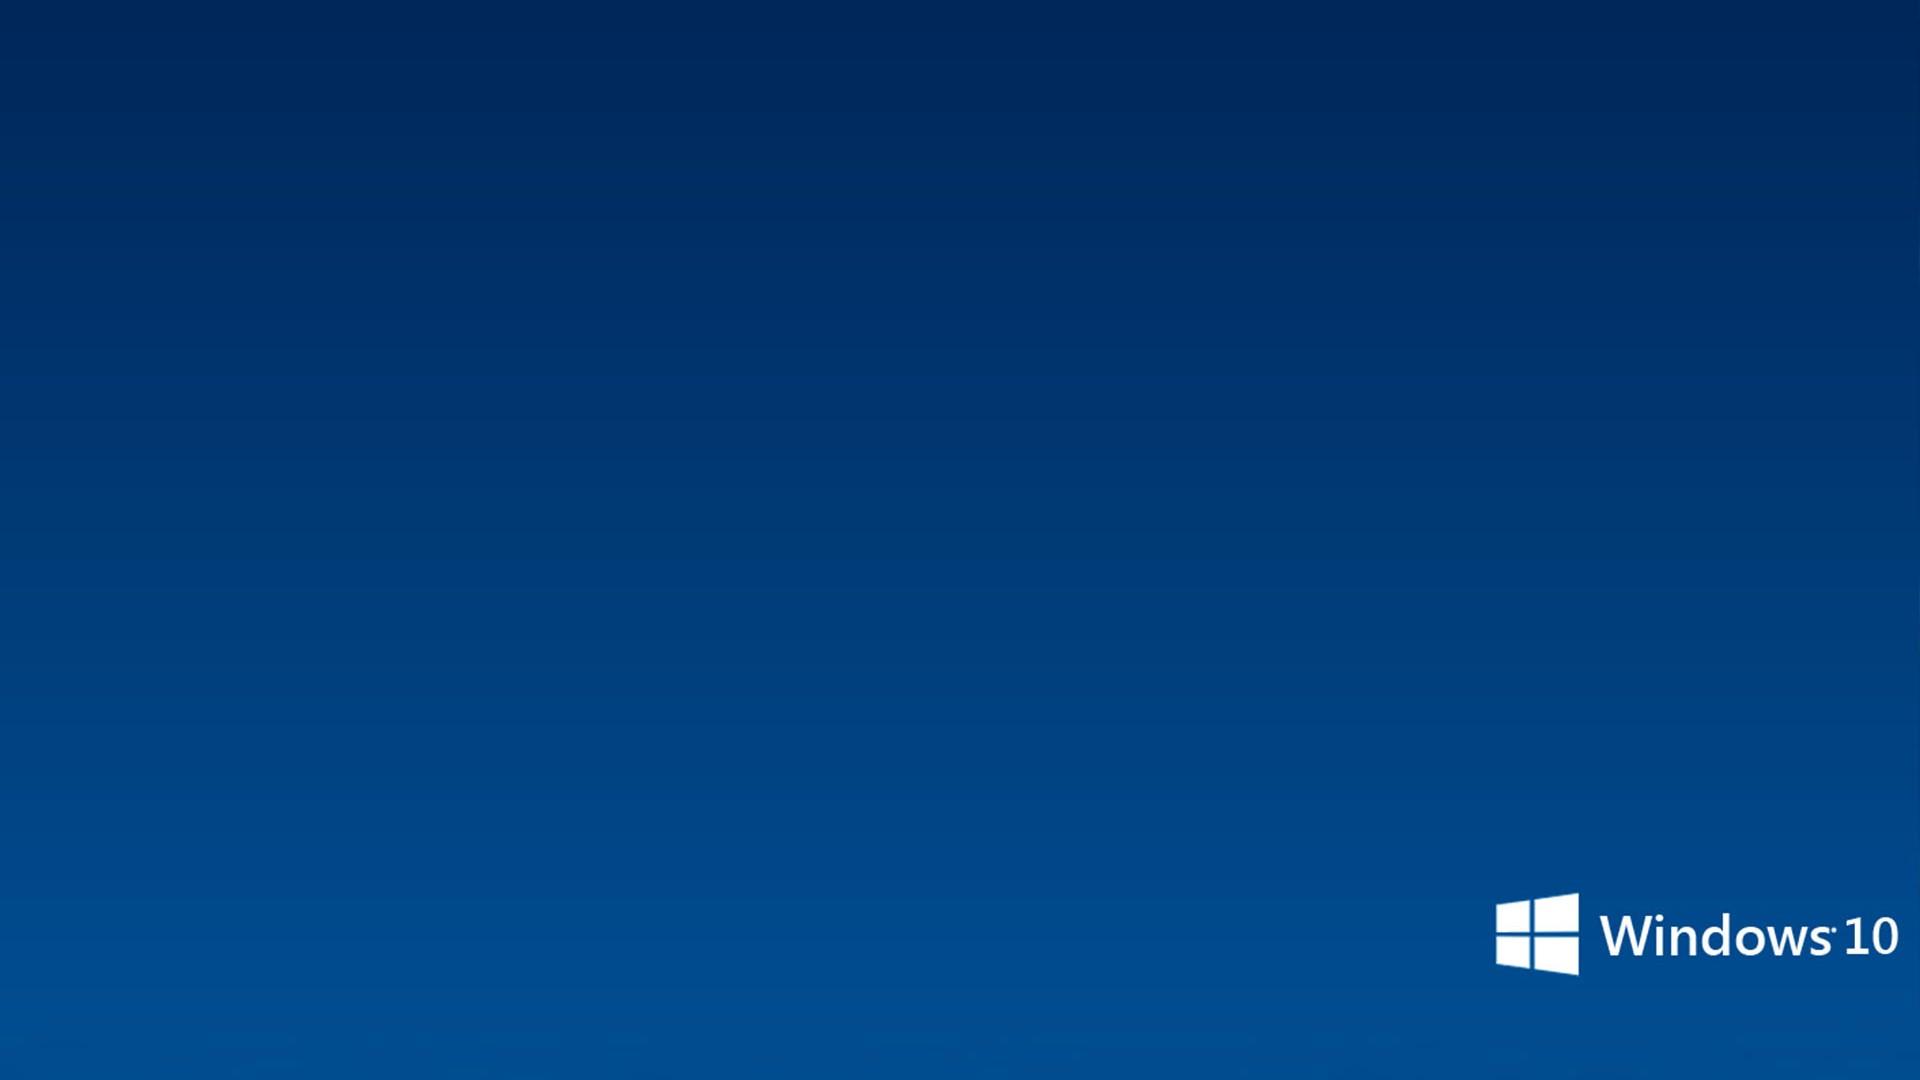 Free Download Simple Microsoft Windows 10 Wallpaper